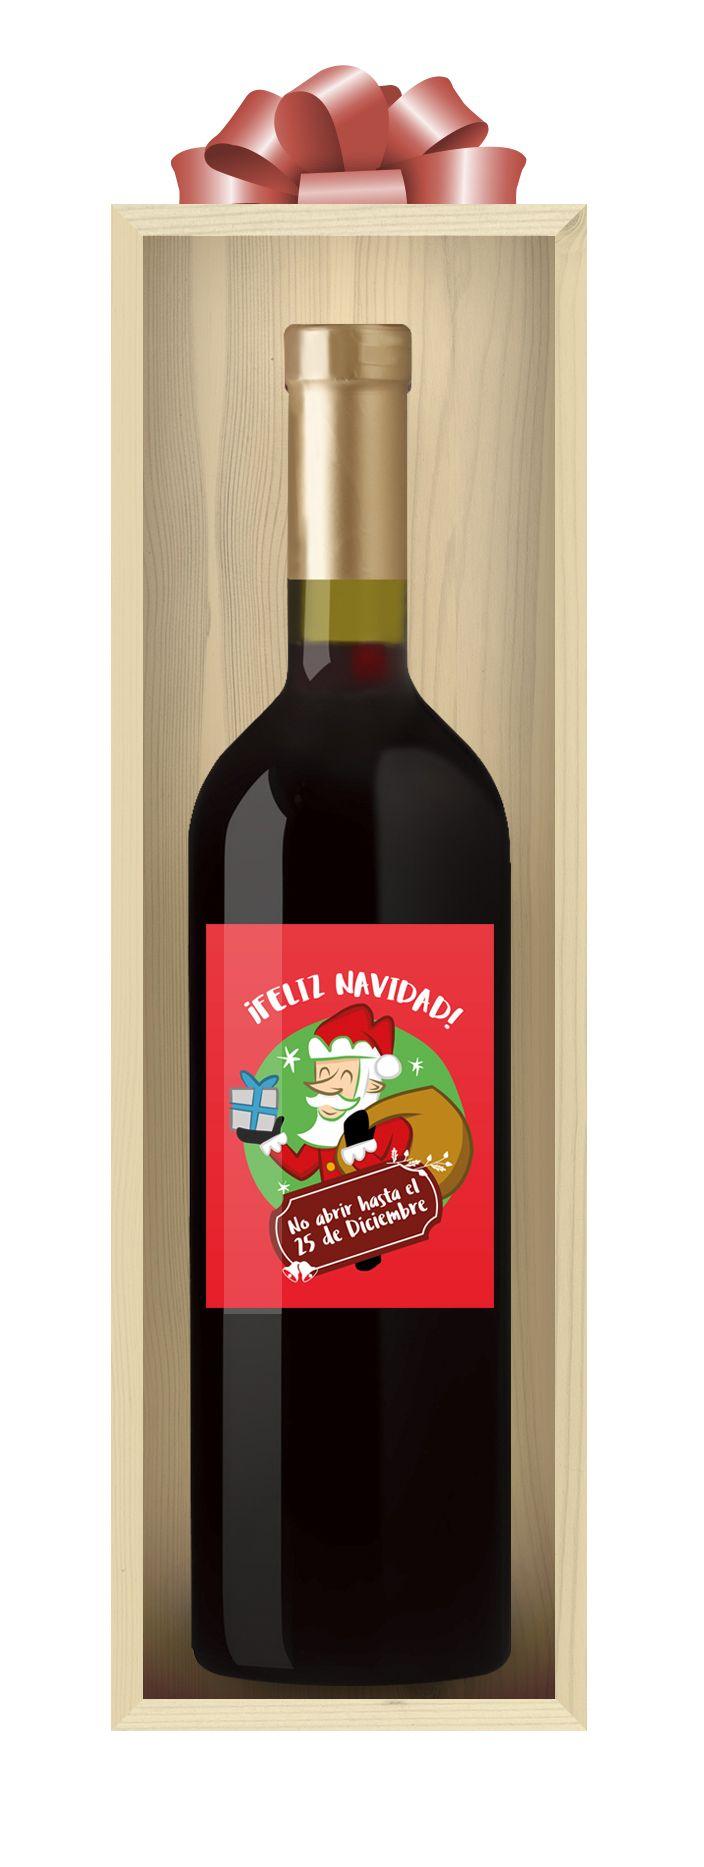 Foto de Vino personalizado Feliz Navidad de Etiqueta tu Vino